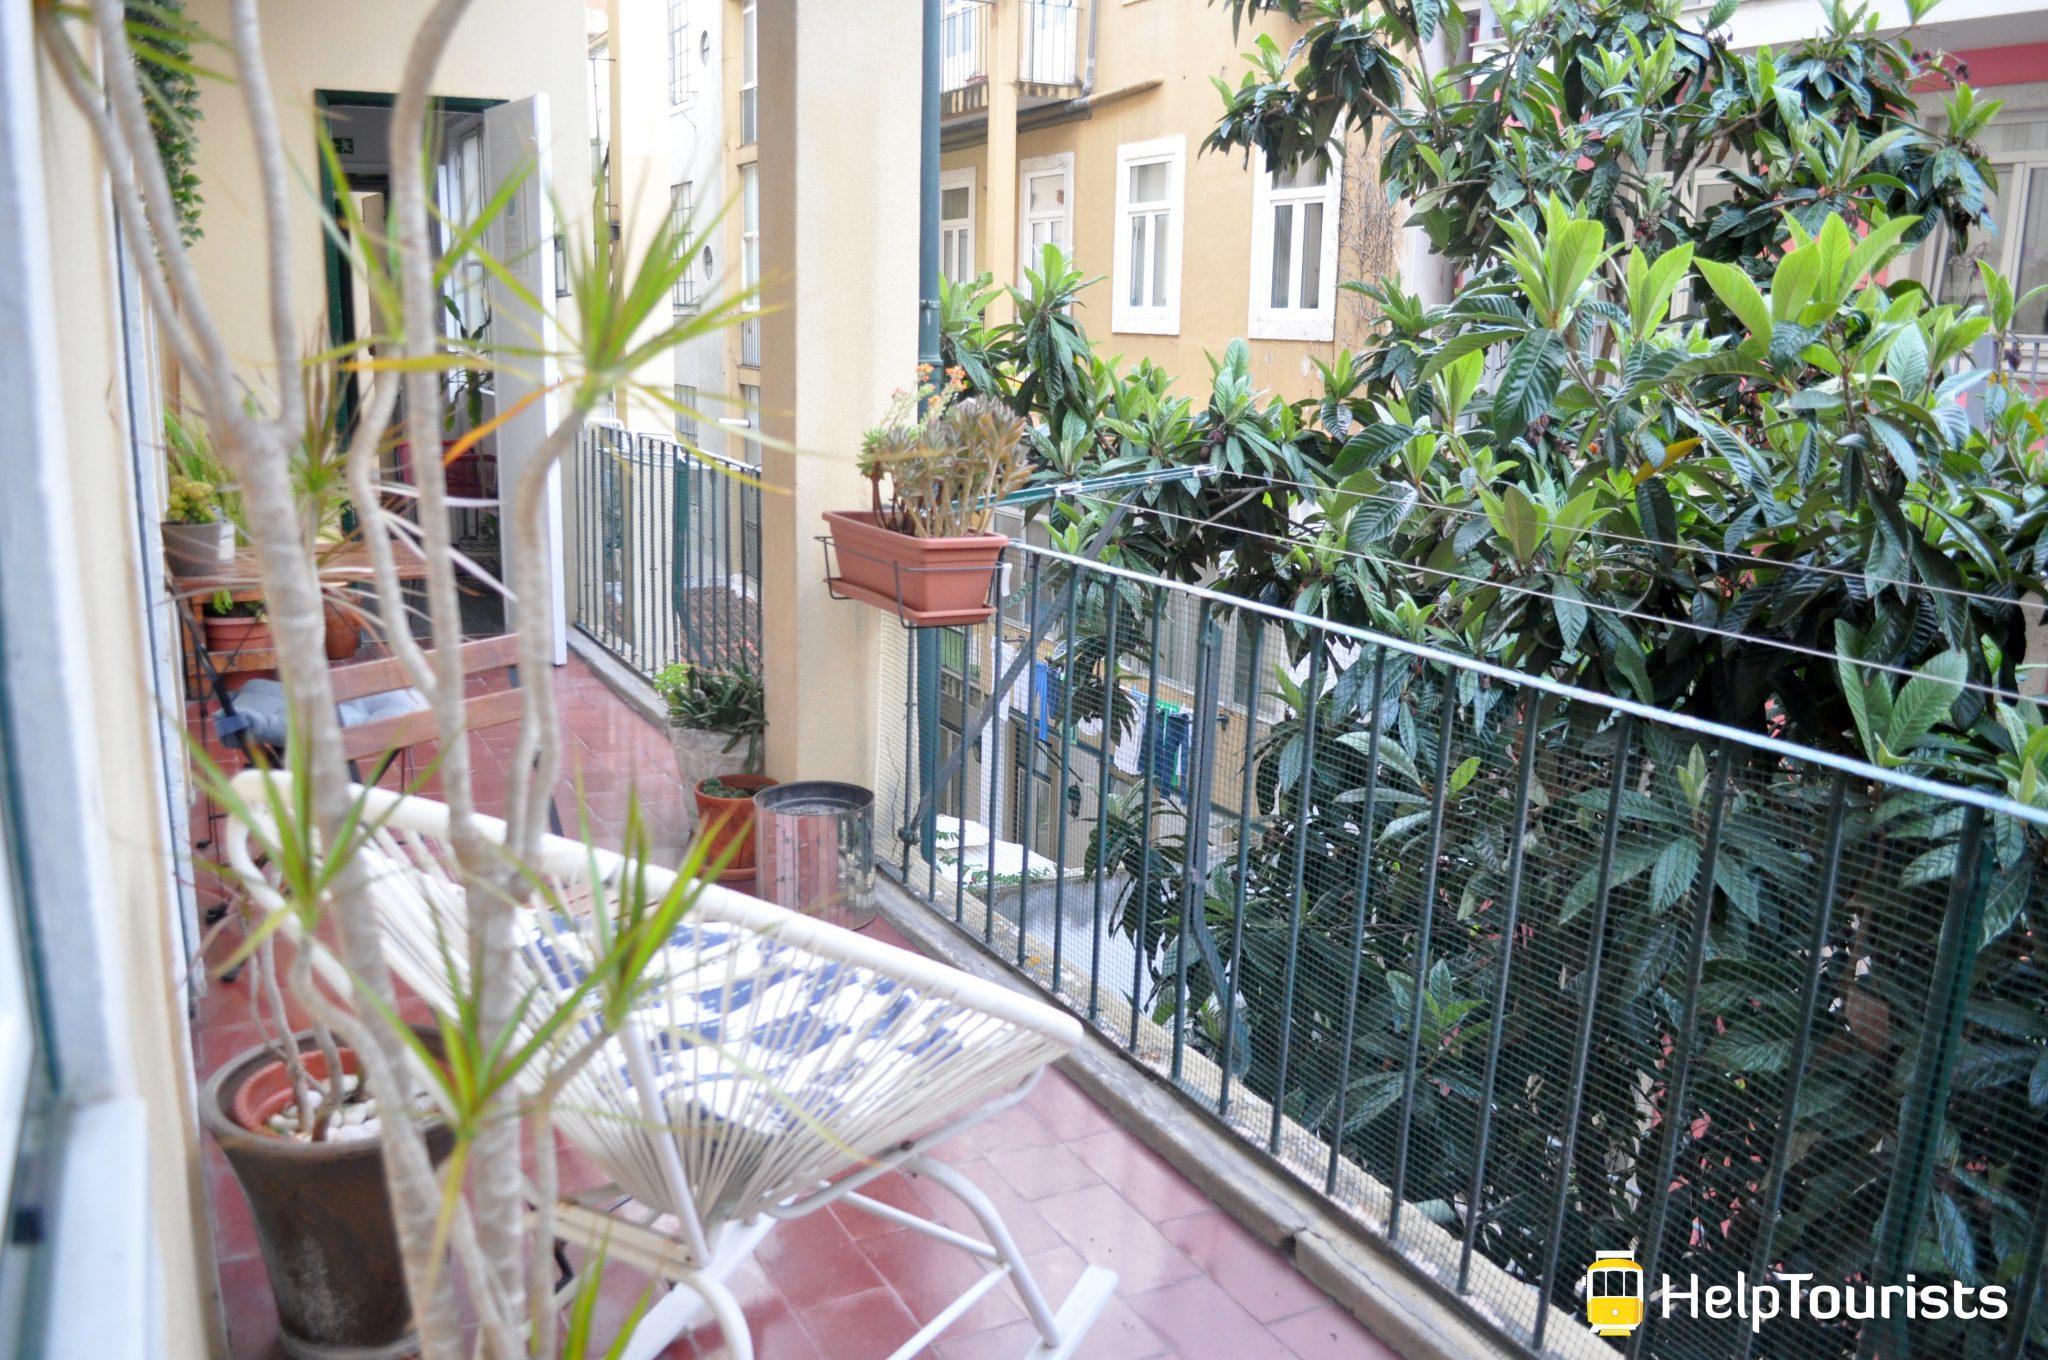 Lissabon Unterkunft Zentrum Balkon